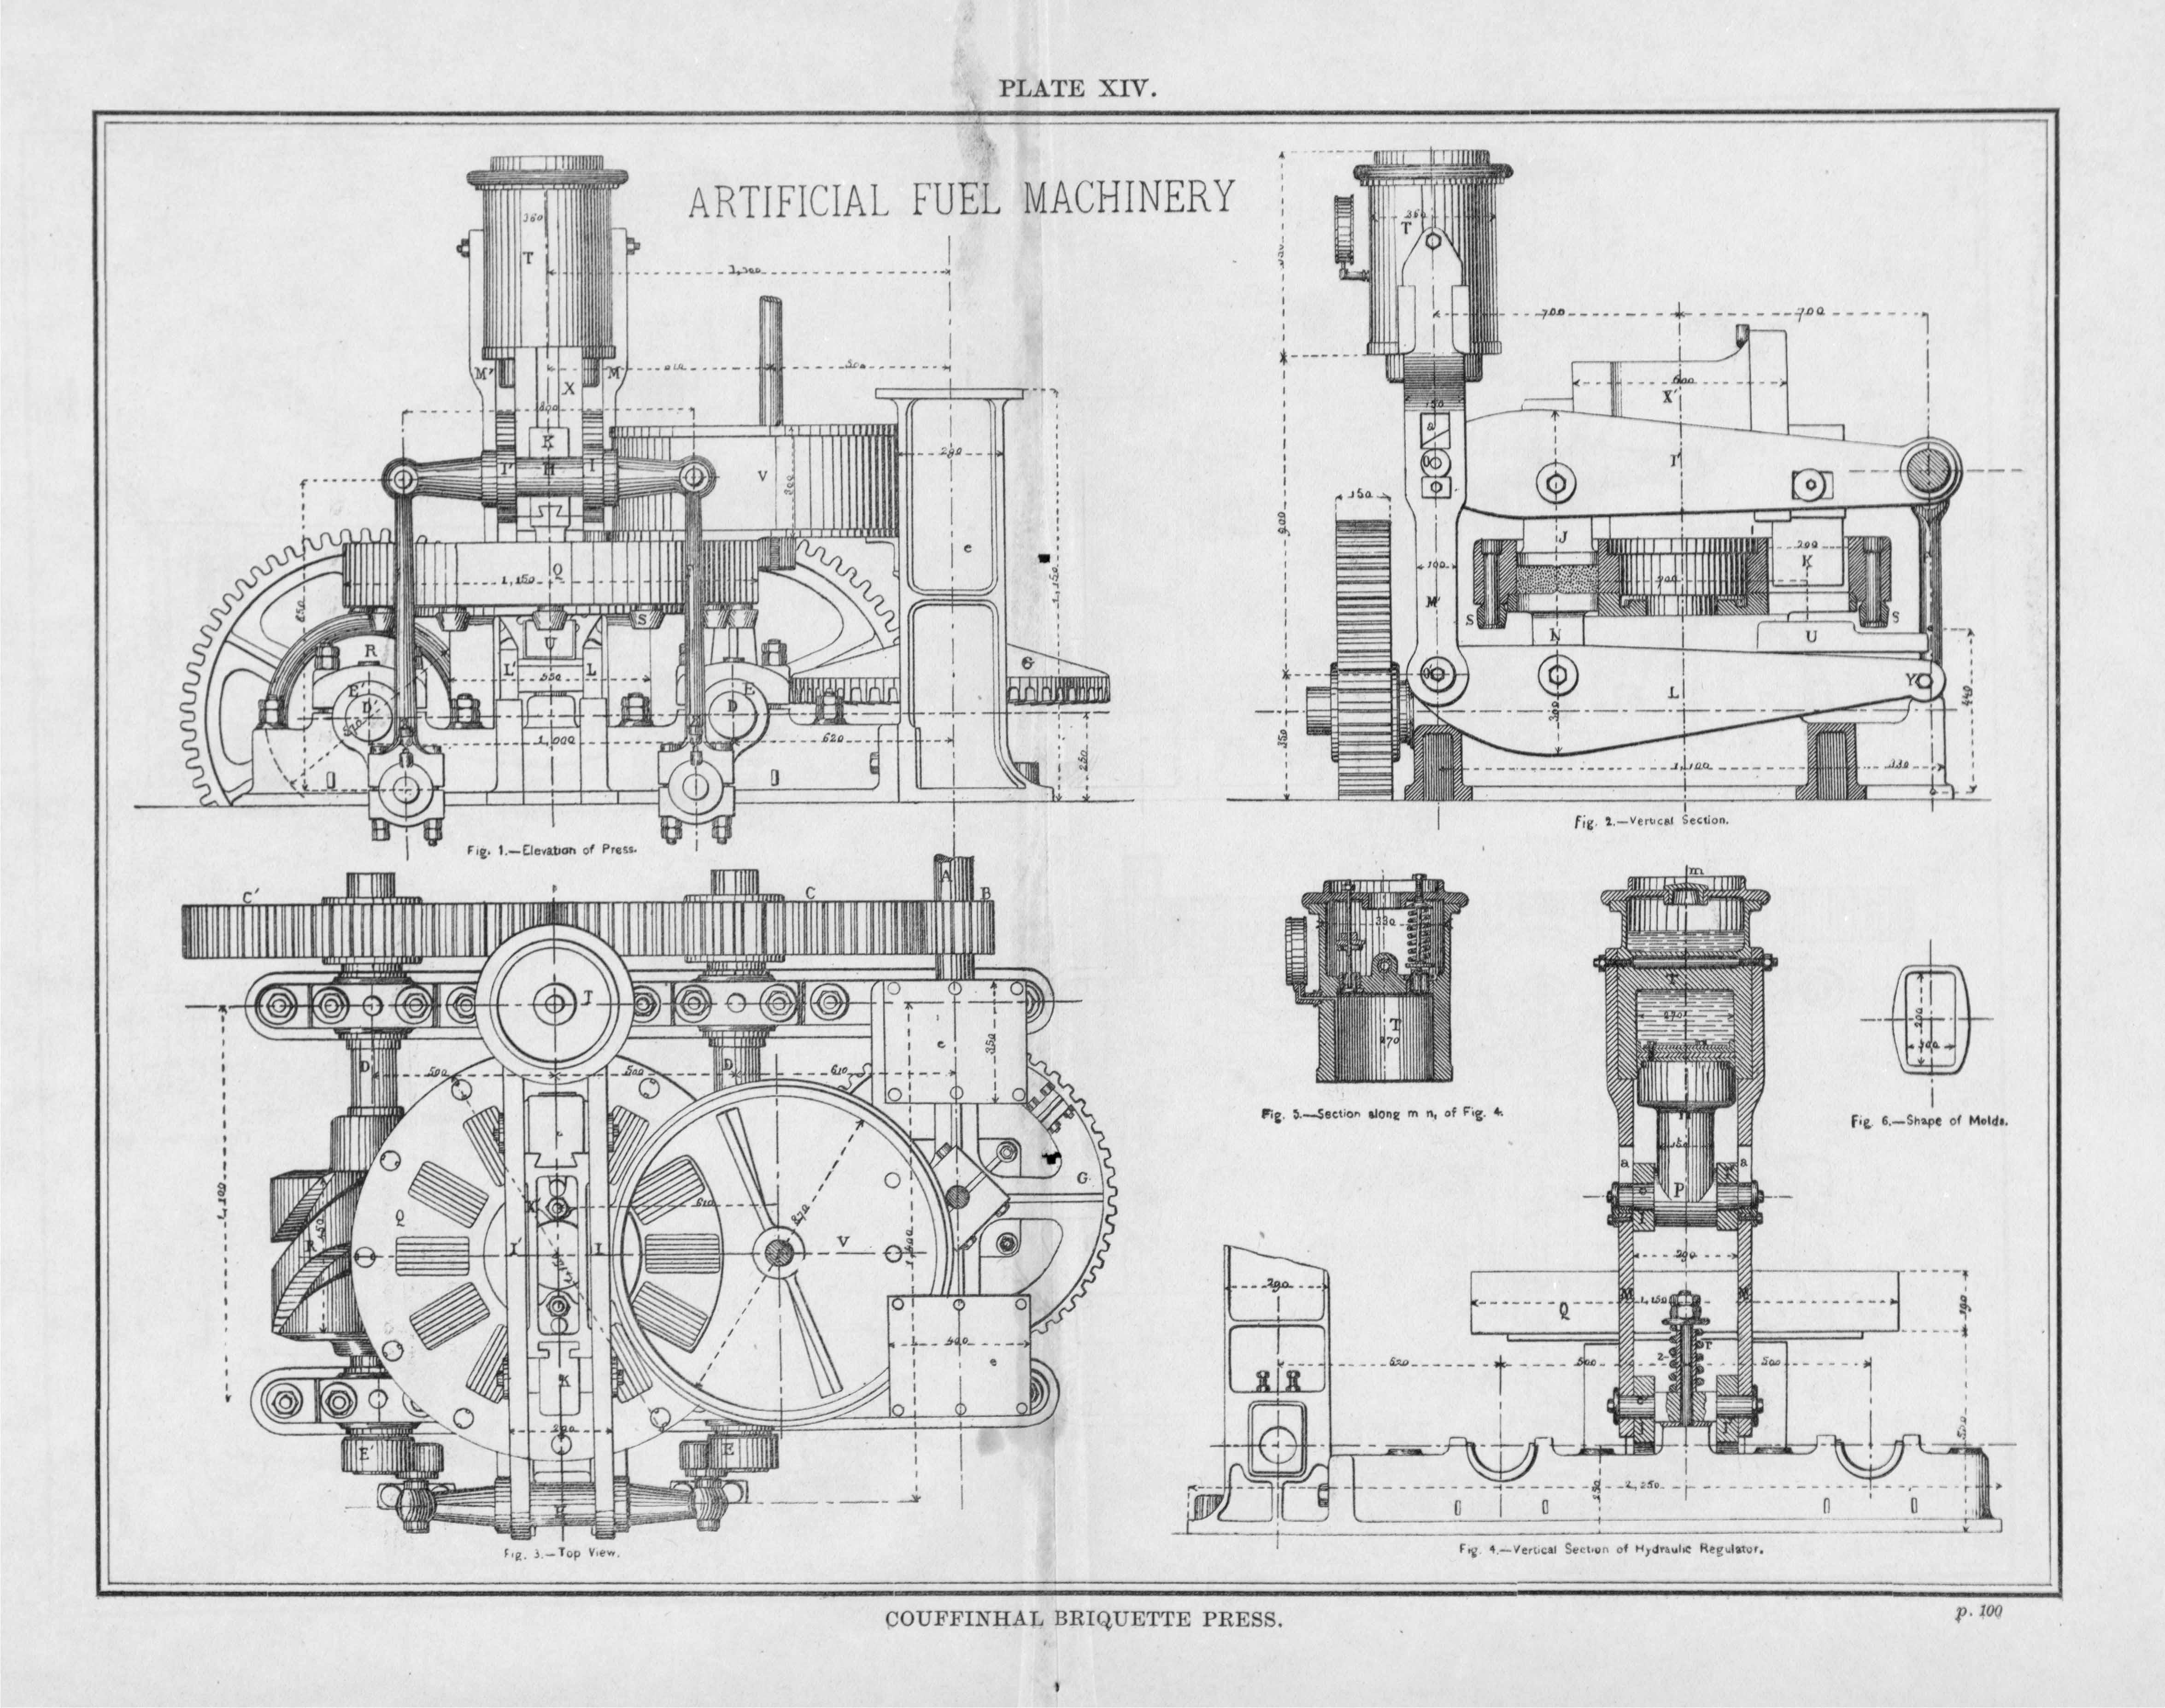 File:Couffinhal Briquette Press.jpg - Wikimedia Commons